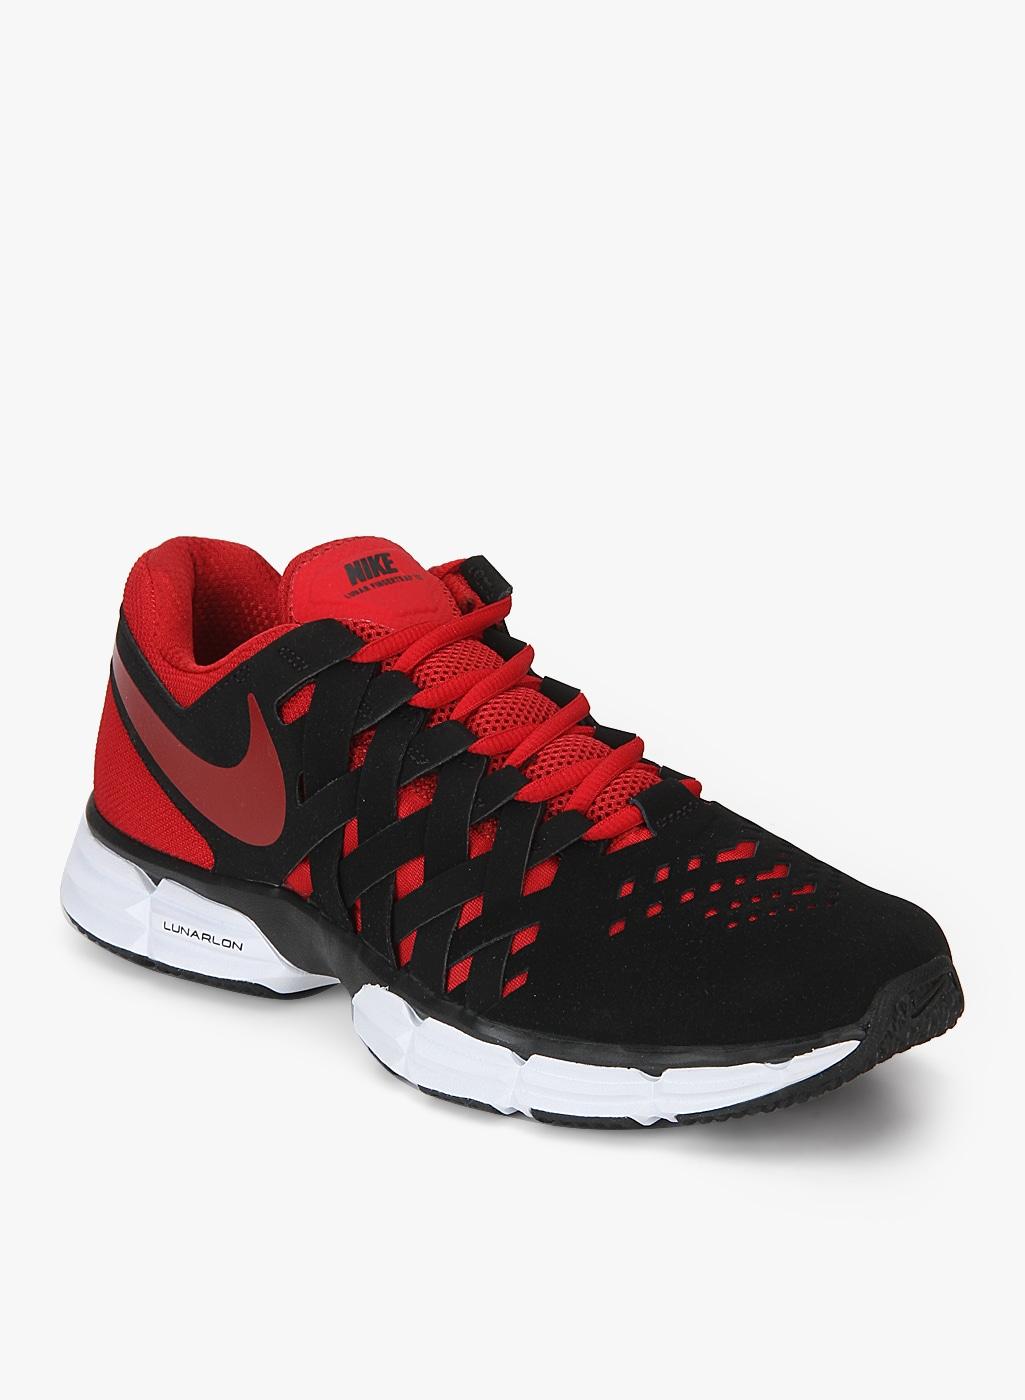 Nike Lunar Fingertrap Tr Black Training Shoes